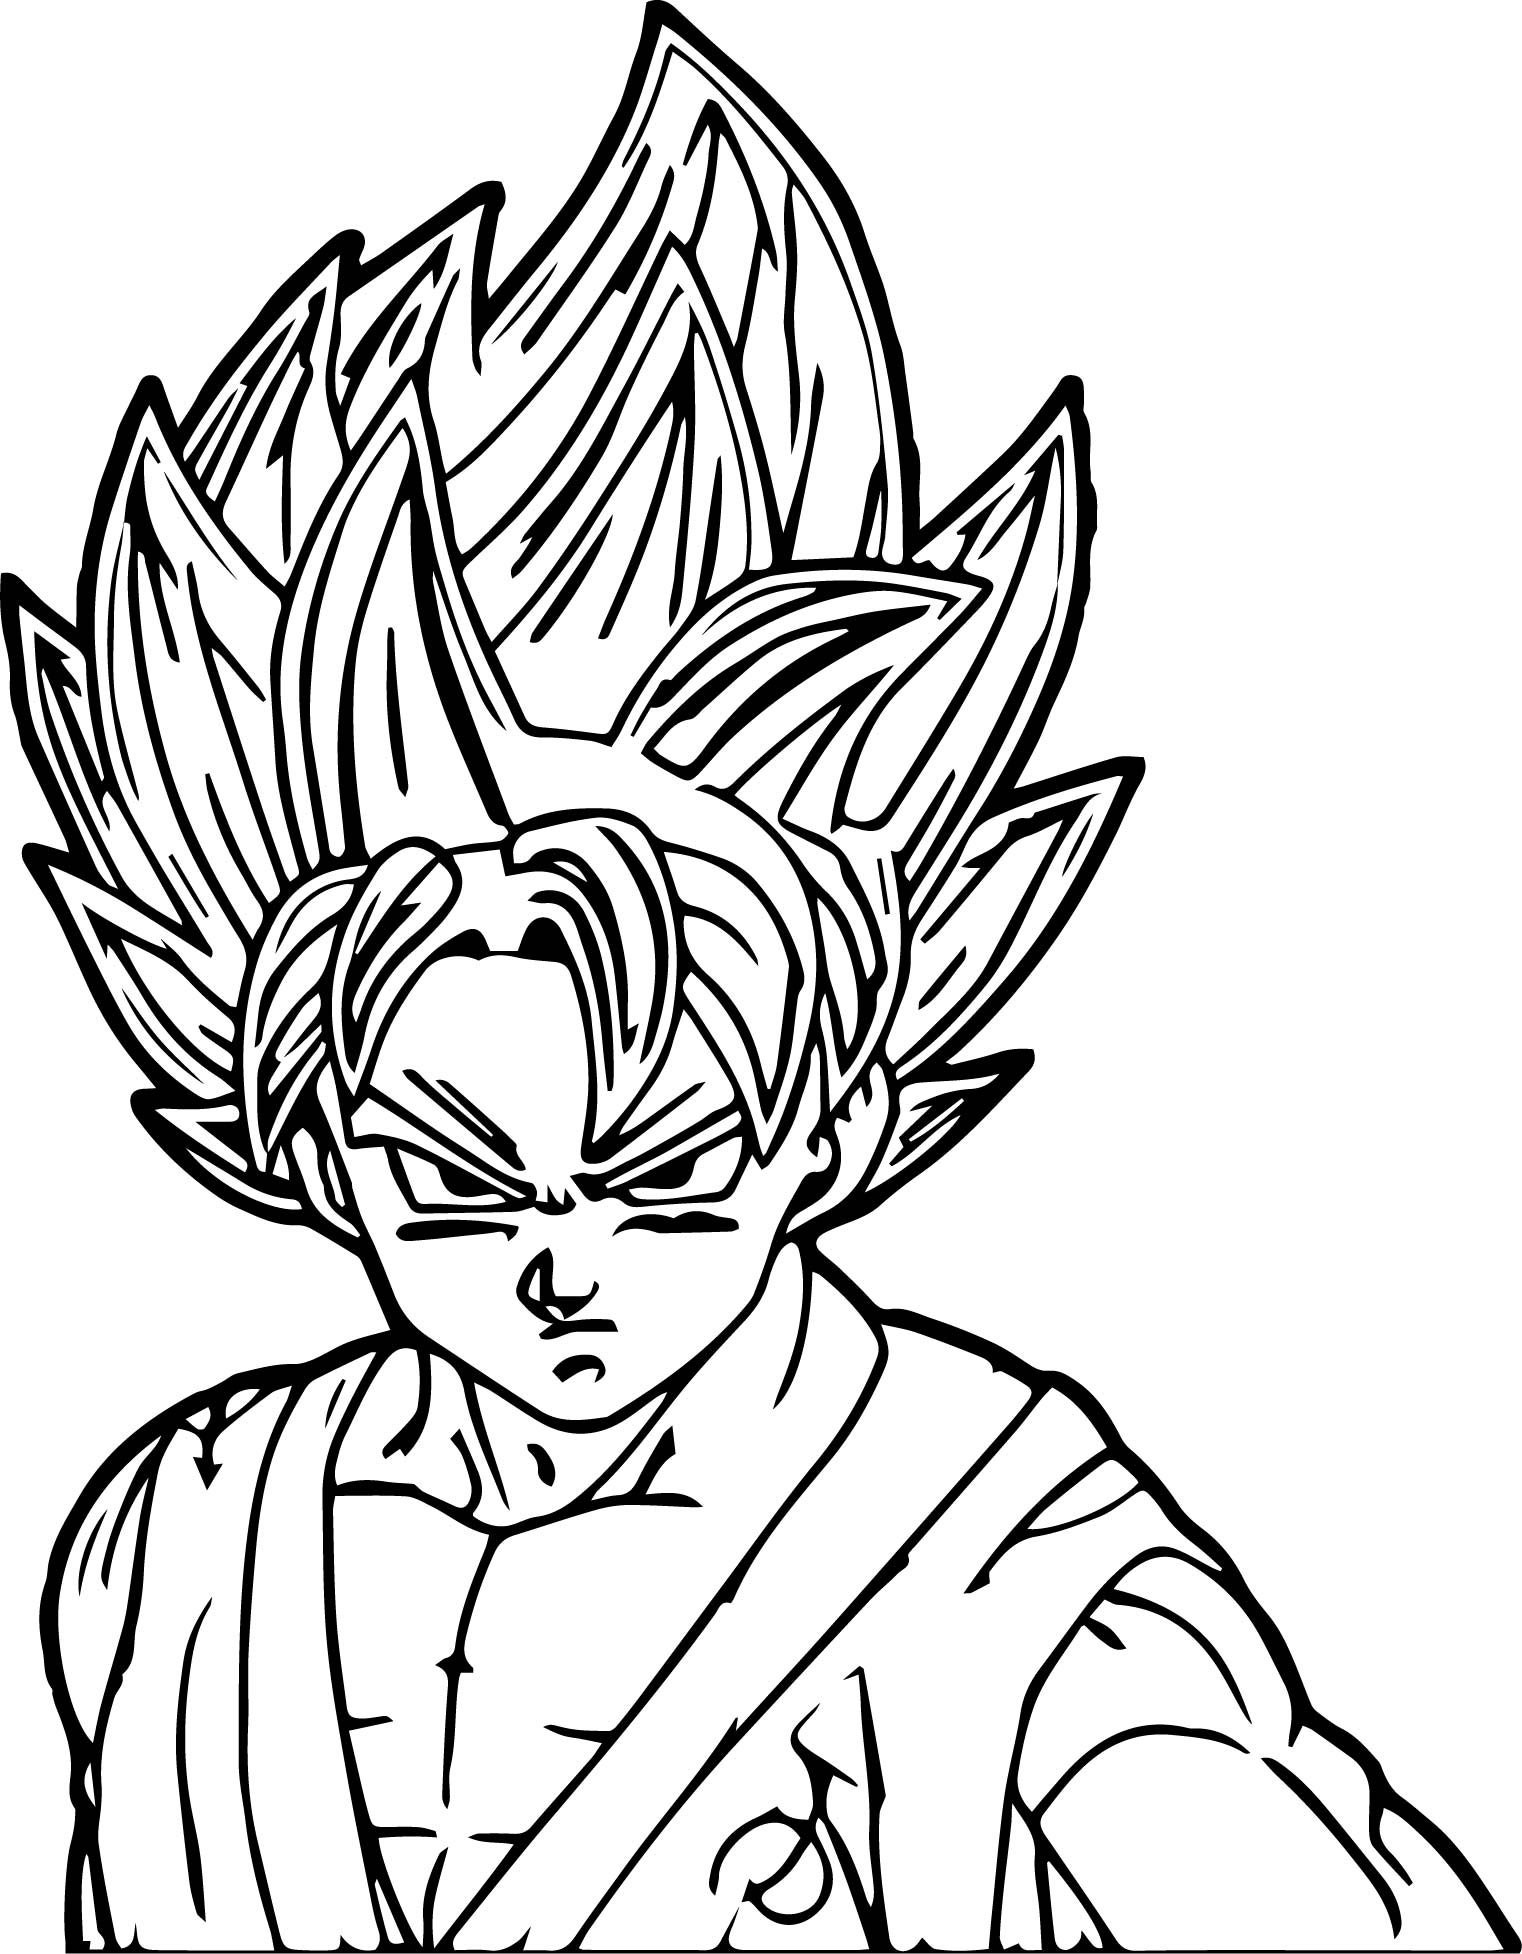 Goku We Coloring Page 463